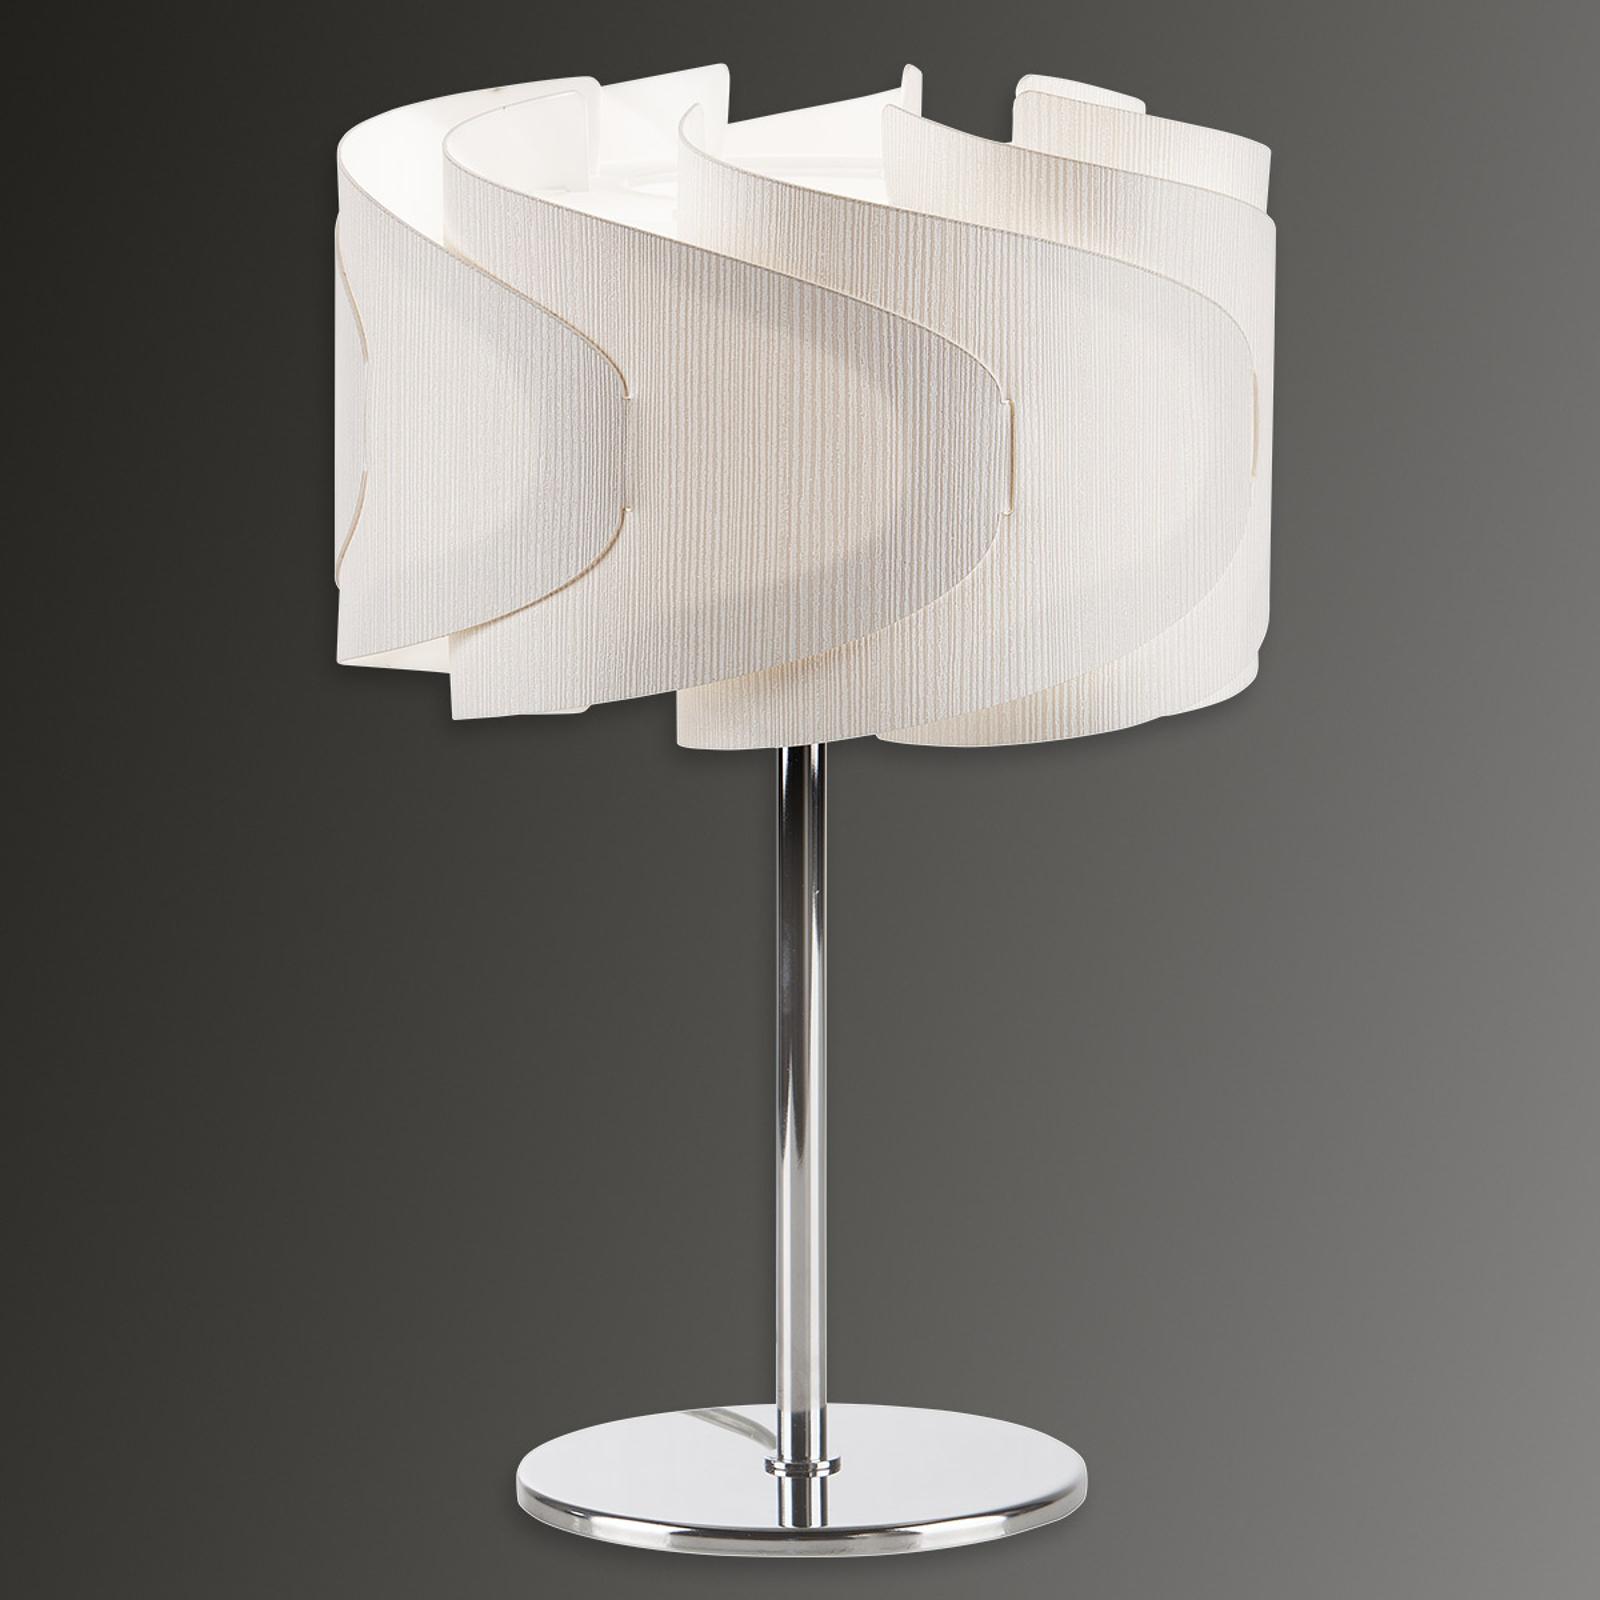 Tafellamp Lumetto Ellix in houtoptiek